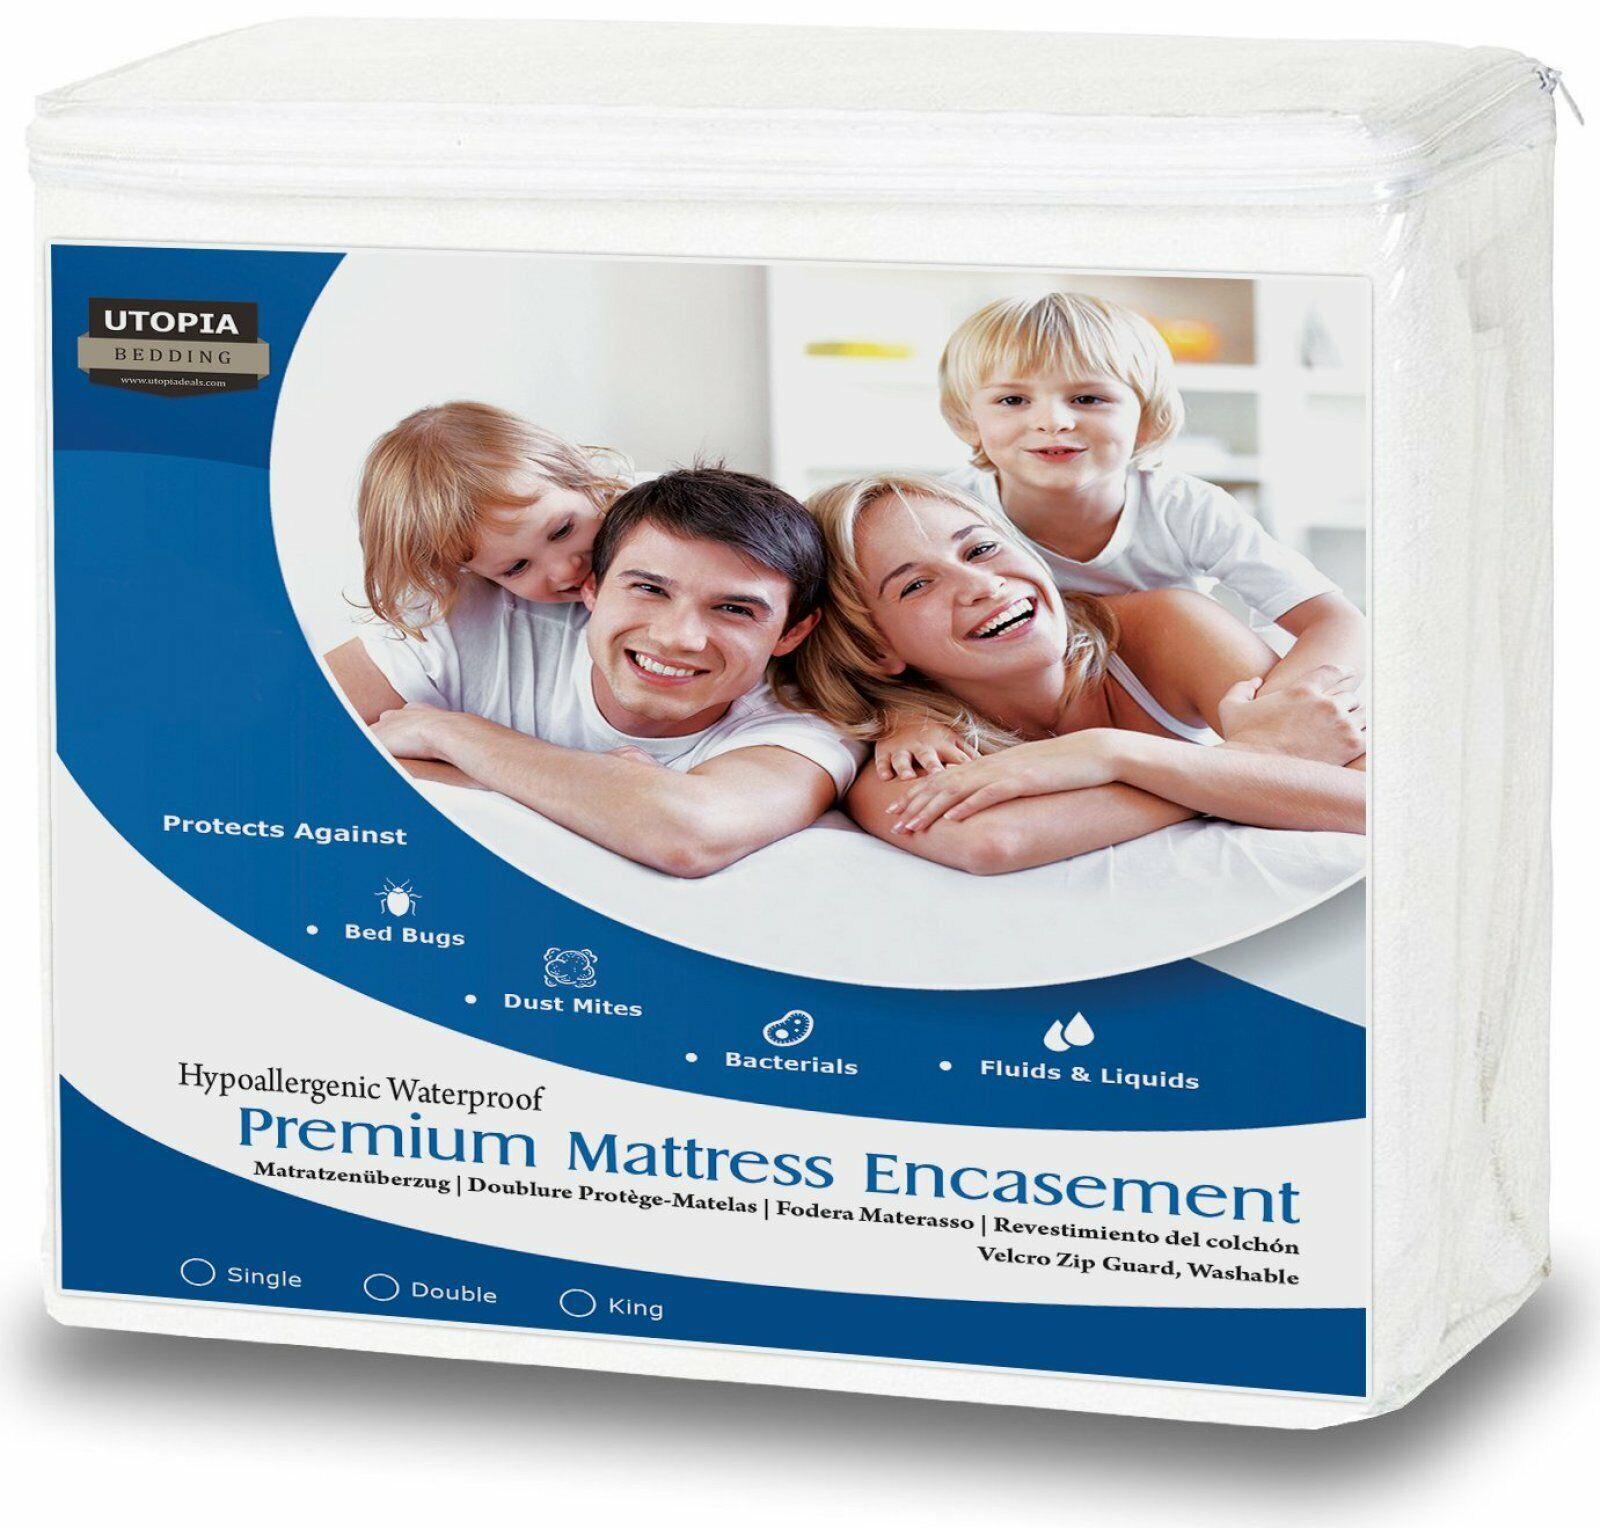 Fermeture éclair Imperméable Matelas enrobage Bed Bug proof cover Double King